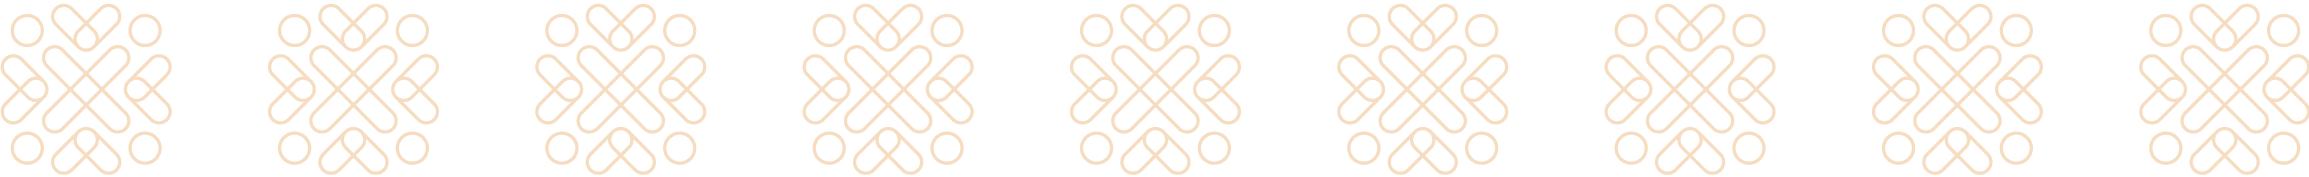 Chantel-Adams-Cream-Divider.png